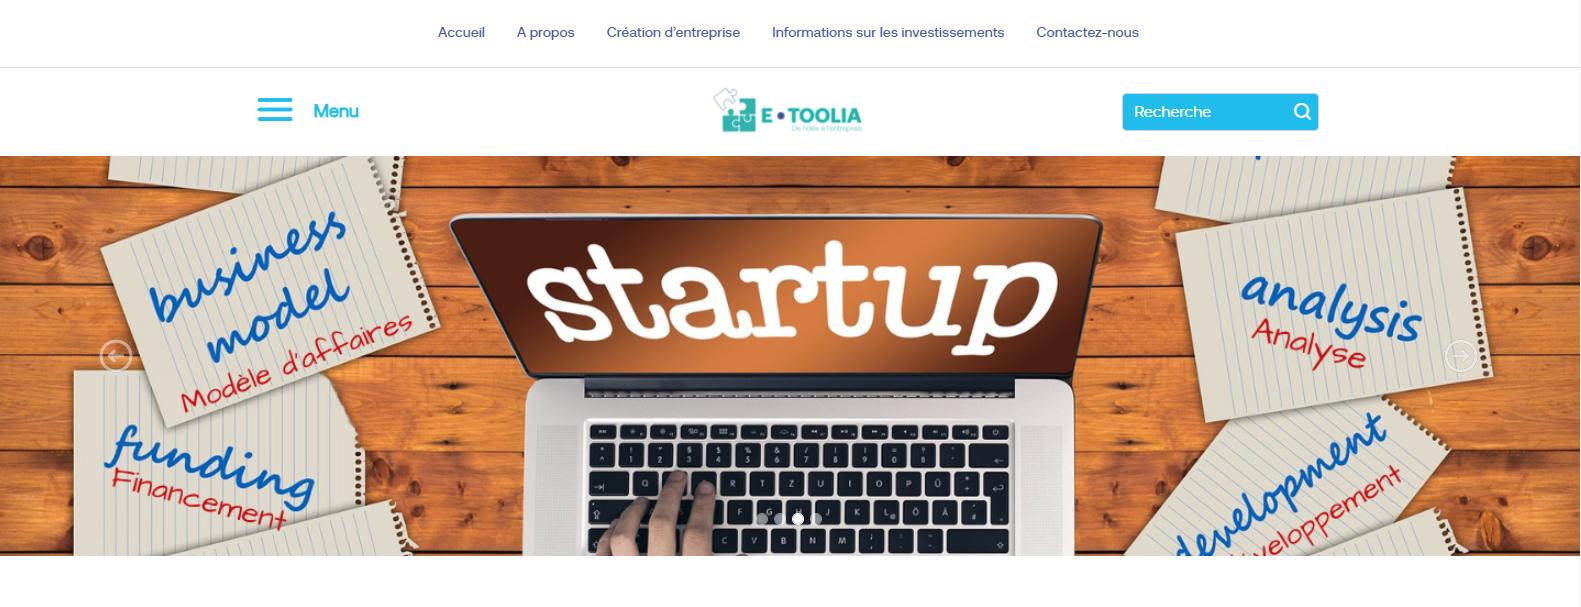 etoolia outils d'aide plateforme digitale formation entrepreunariat en ligne